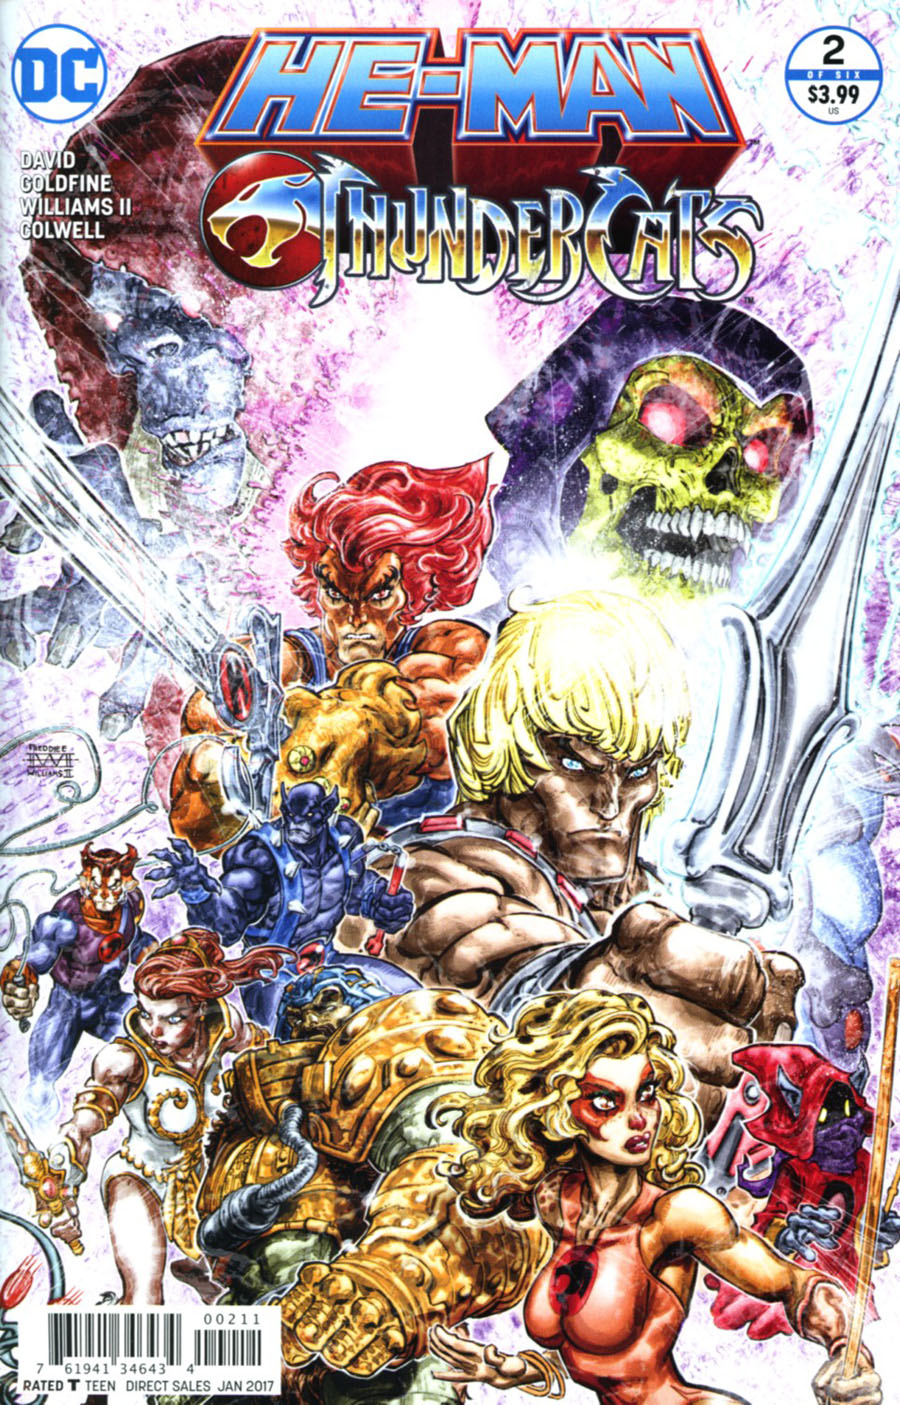 He-Man Thundercats #2